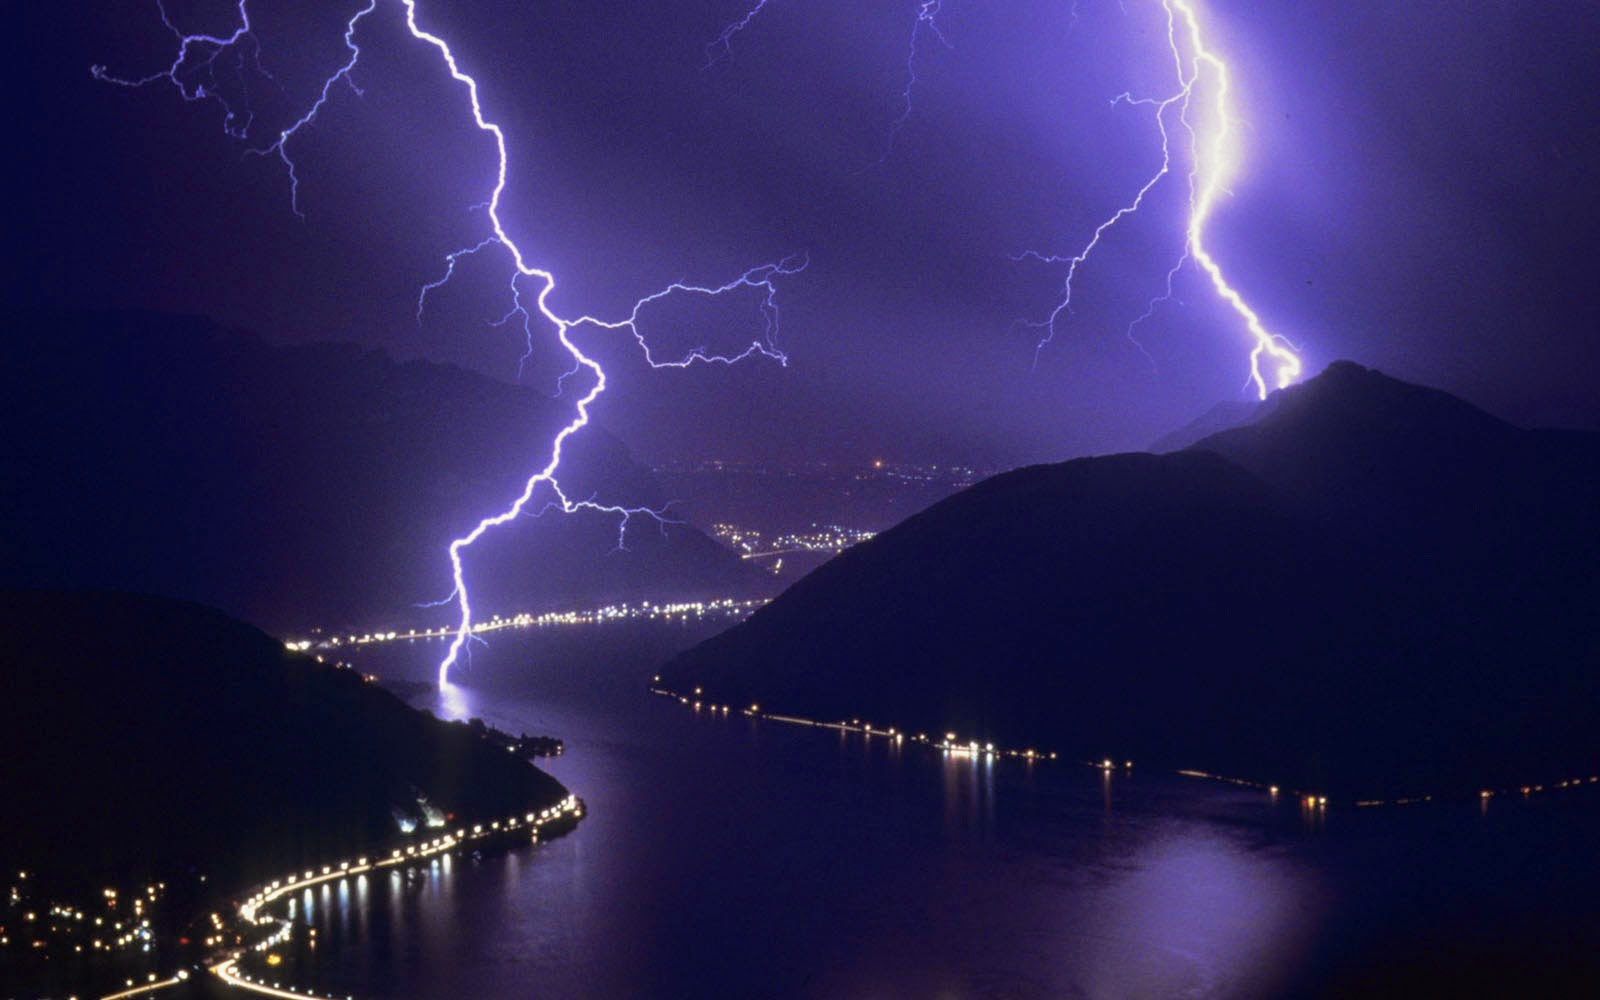 wallpapers: Lightning Wallpapers